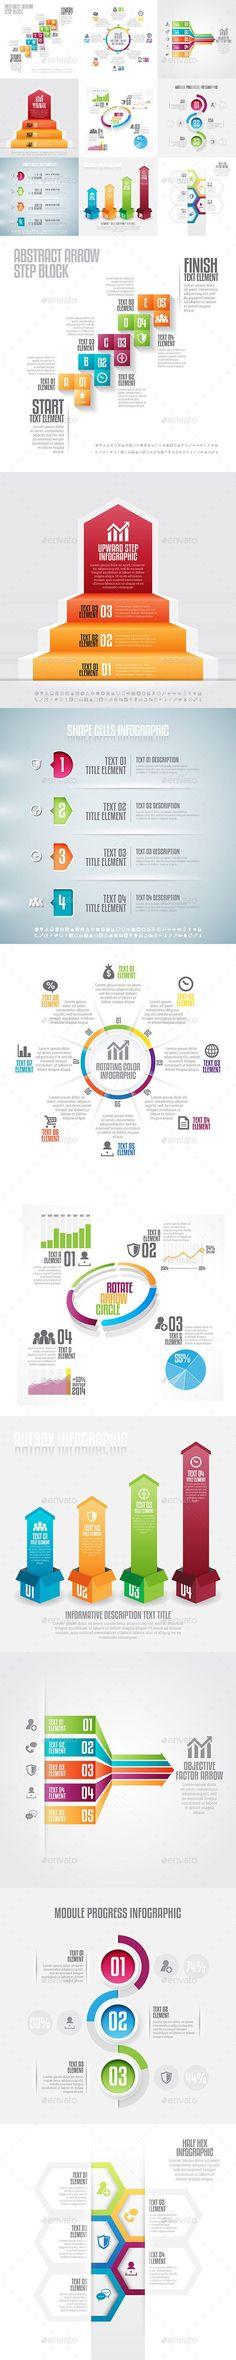 Infographic Set Template #design Download: http://graphicriver.net/item/infographic-set-18/12999644?ref=ksioks